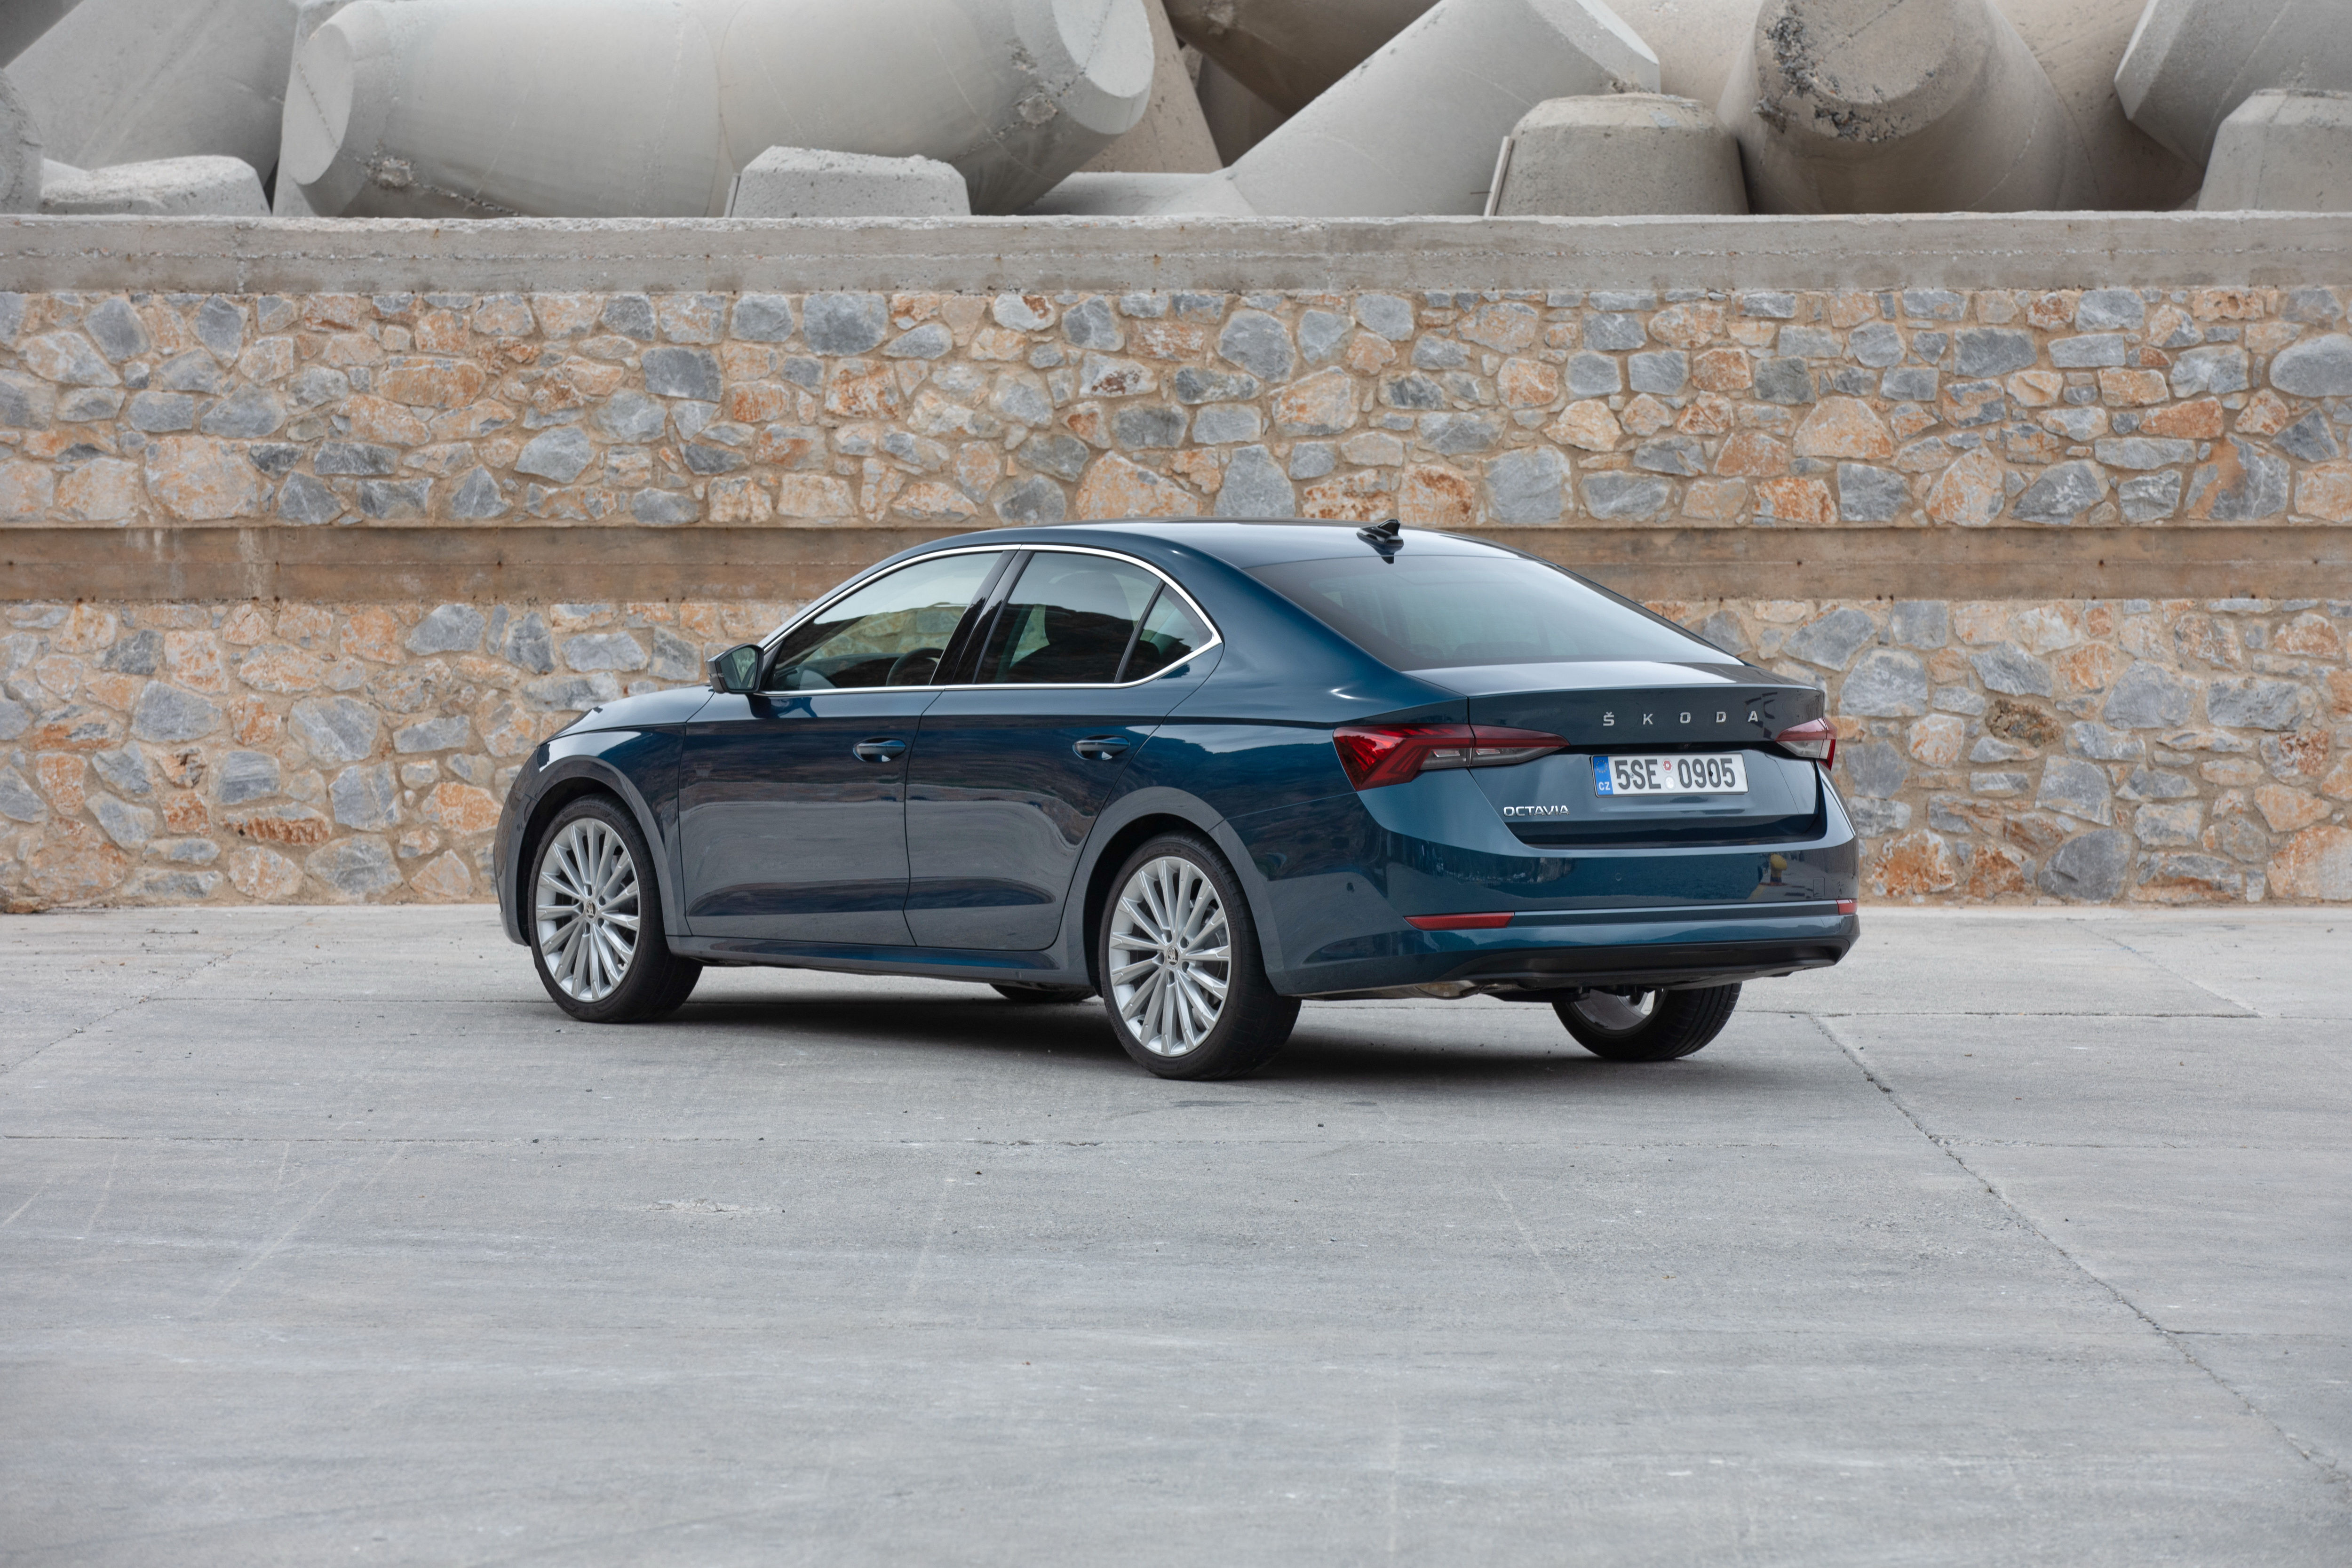 The all-new SKODA OCTAVIA: spacious, practical and elegant like a coupé - Image 4